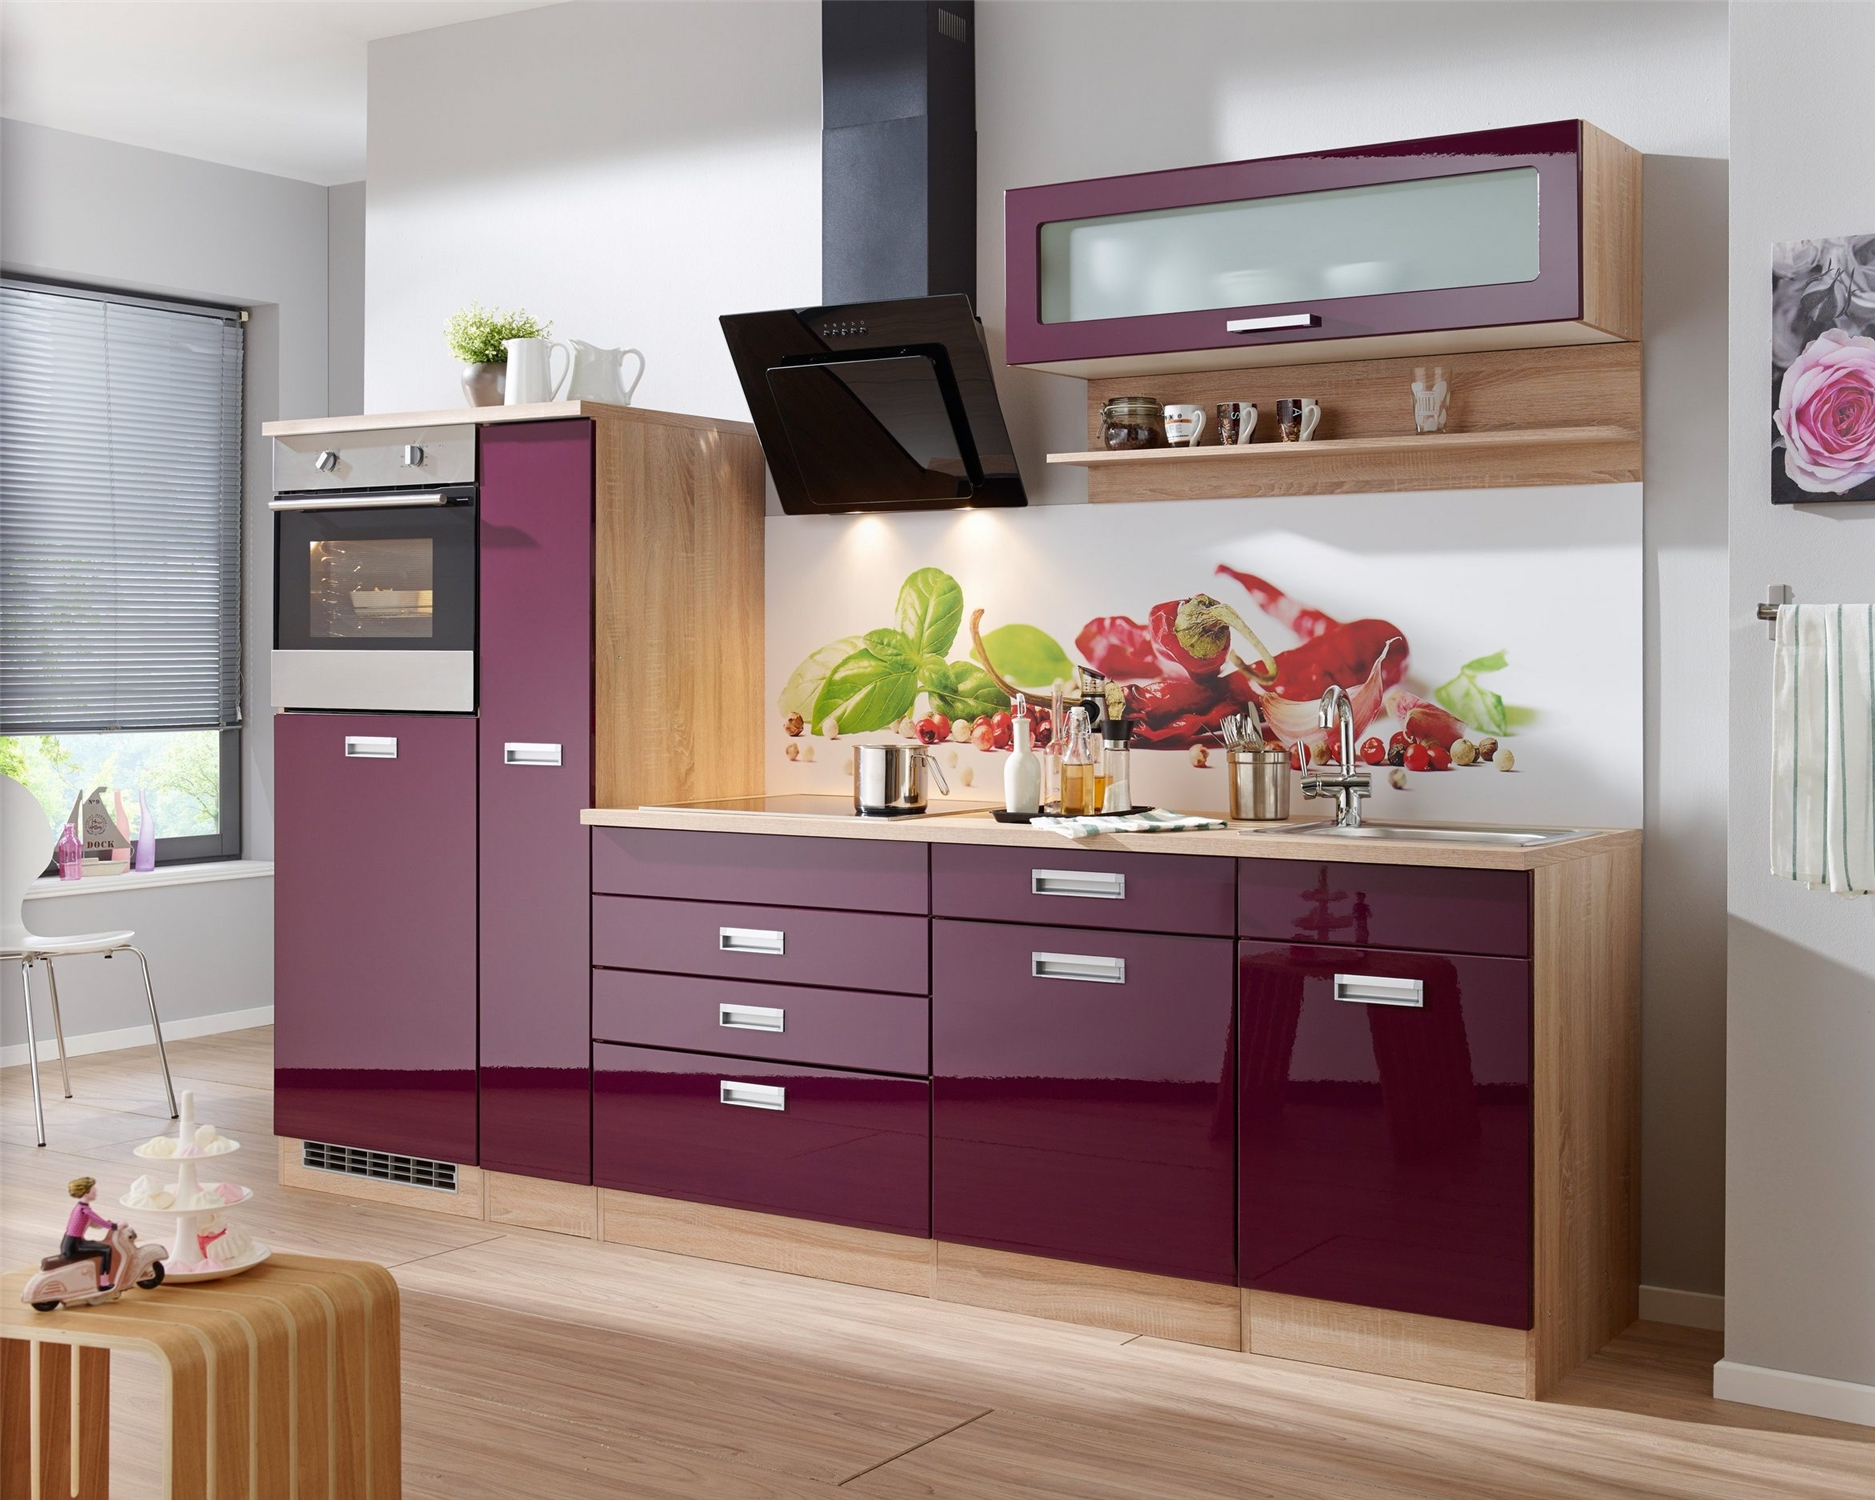 Vermont Burgundy High Gloss Lacquer Kitchen Cabinet For Simple Kitchen Buy High Gloss Lacquer Kitchen Cabinet Doors Kitchen Cabinet Kitchen Cabinet